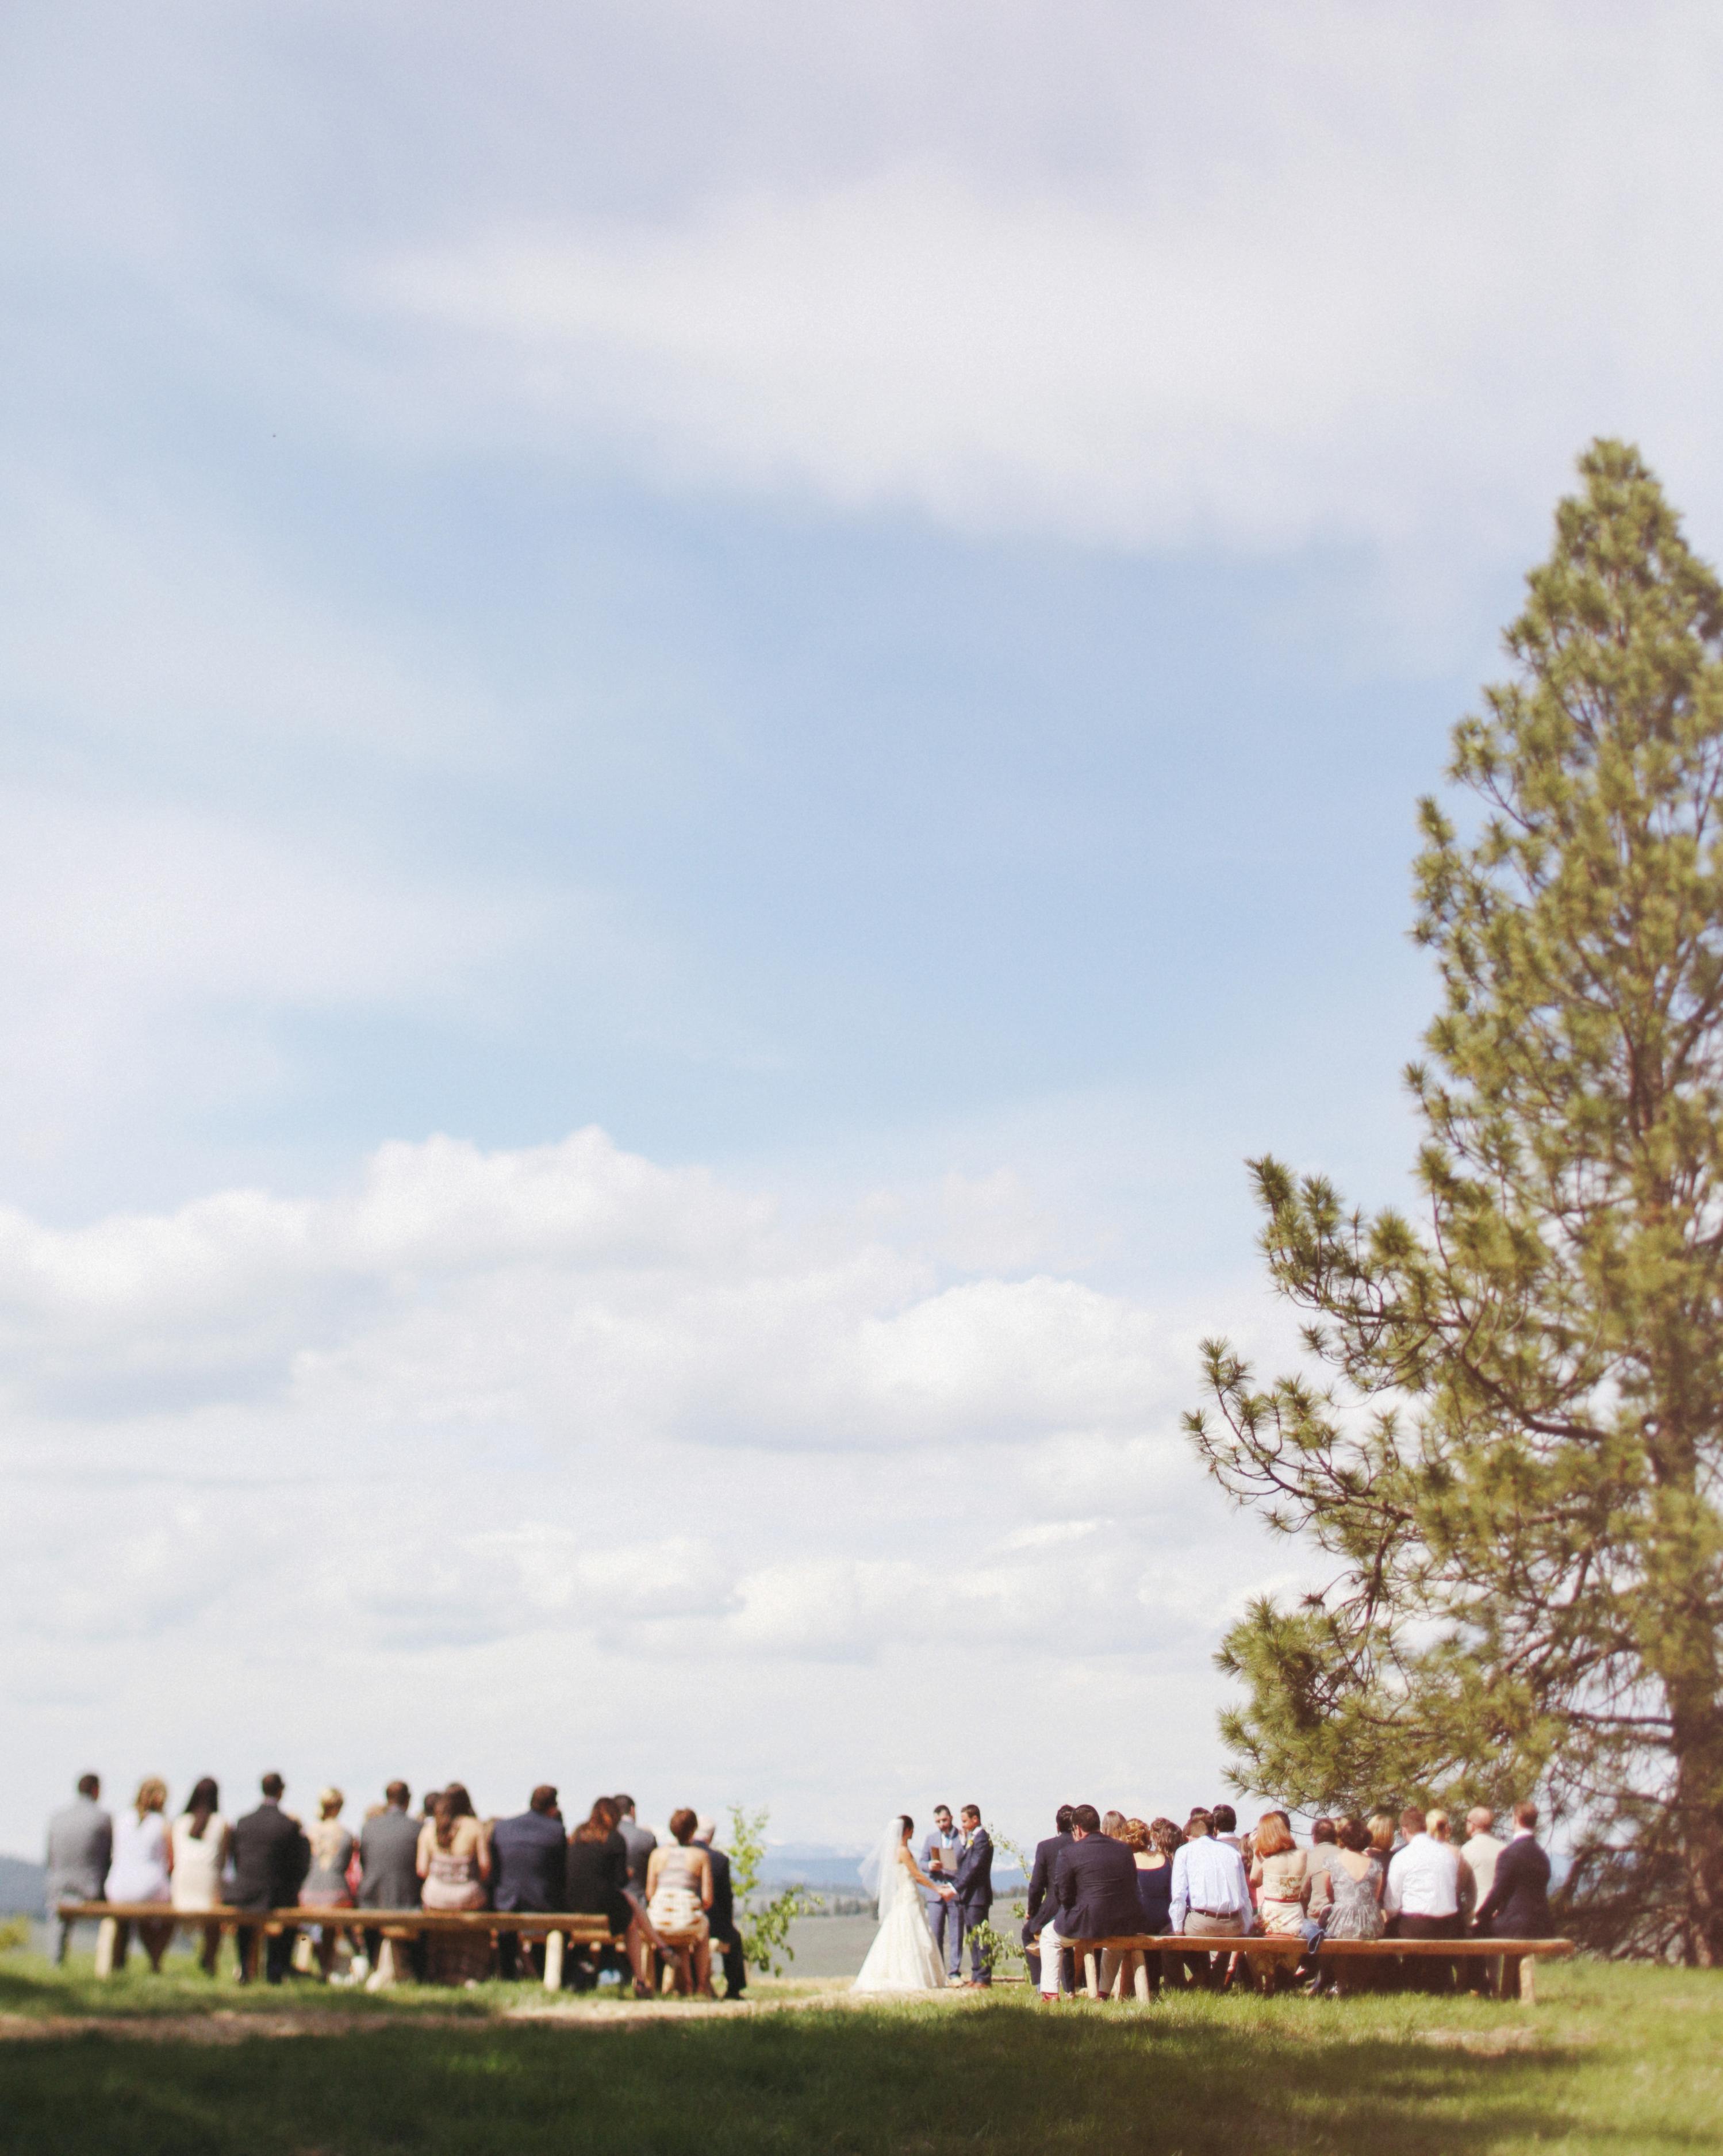 jamie-ryan-wedding-ceremony-033-s111523-0914.jpg